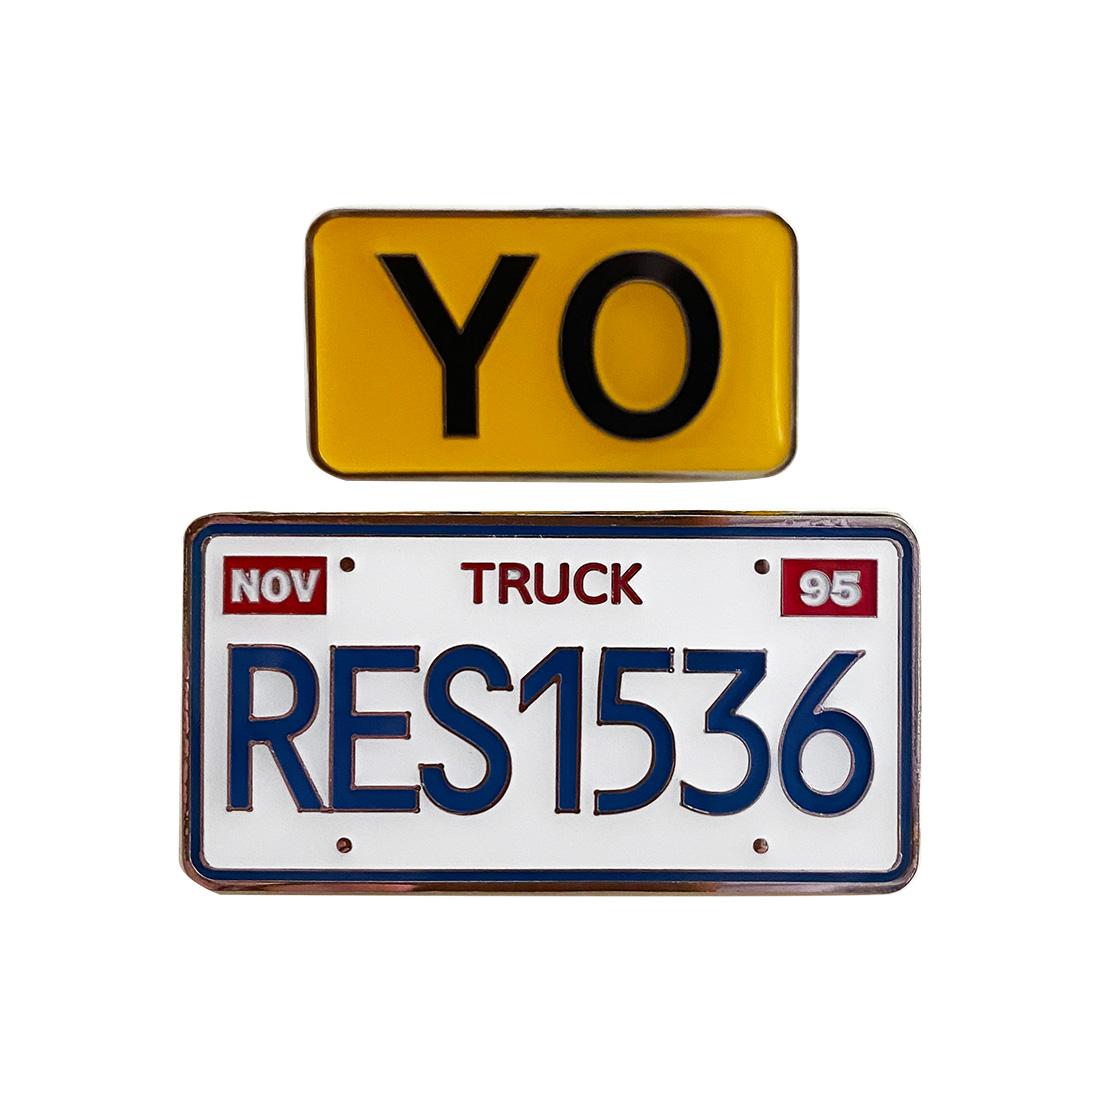 TOYSTORY ピザプラネットトラック ピンズ 大注目 Disney ディズニー トイ APDS5163EM 即納最大半額 ストーリー PLANET PIZZA TRUCK